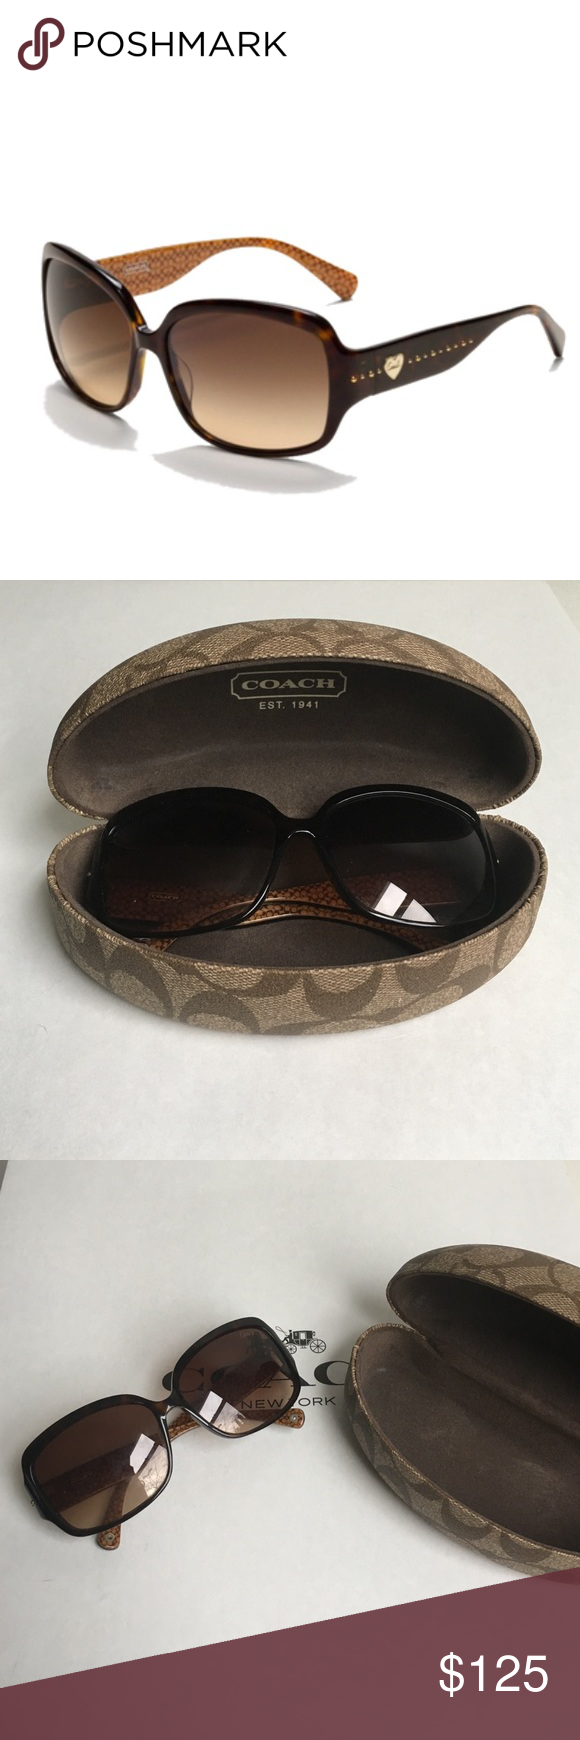 60003098e8 where to buy coach scarlet sunglasses c2a02 cfdb9